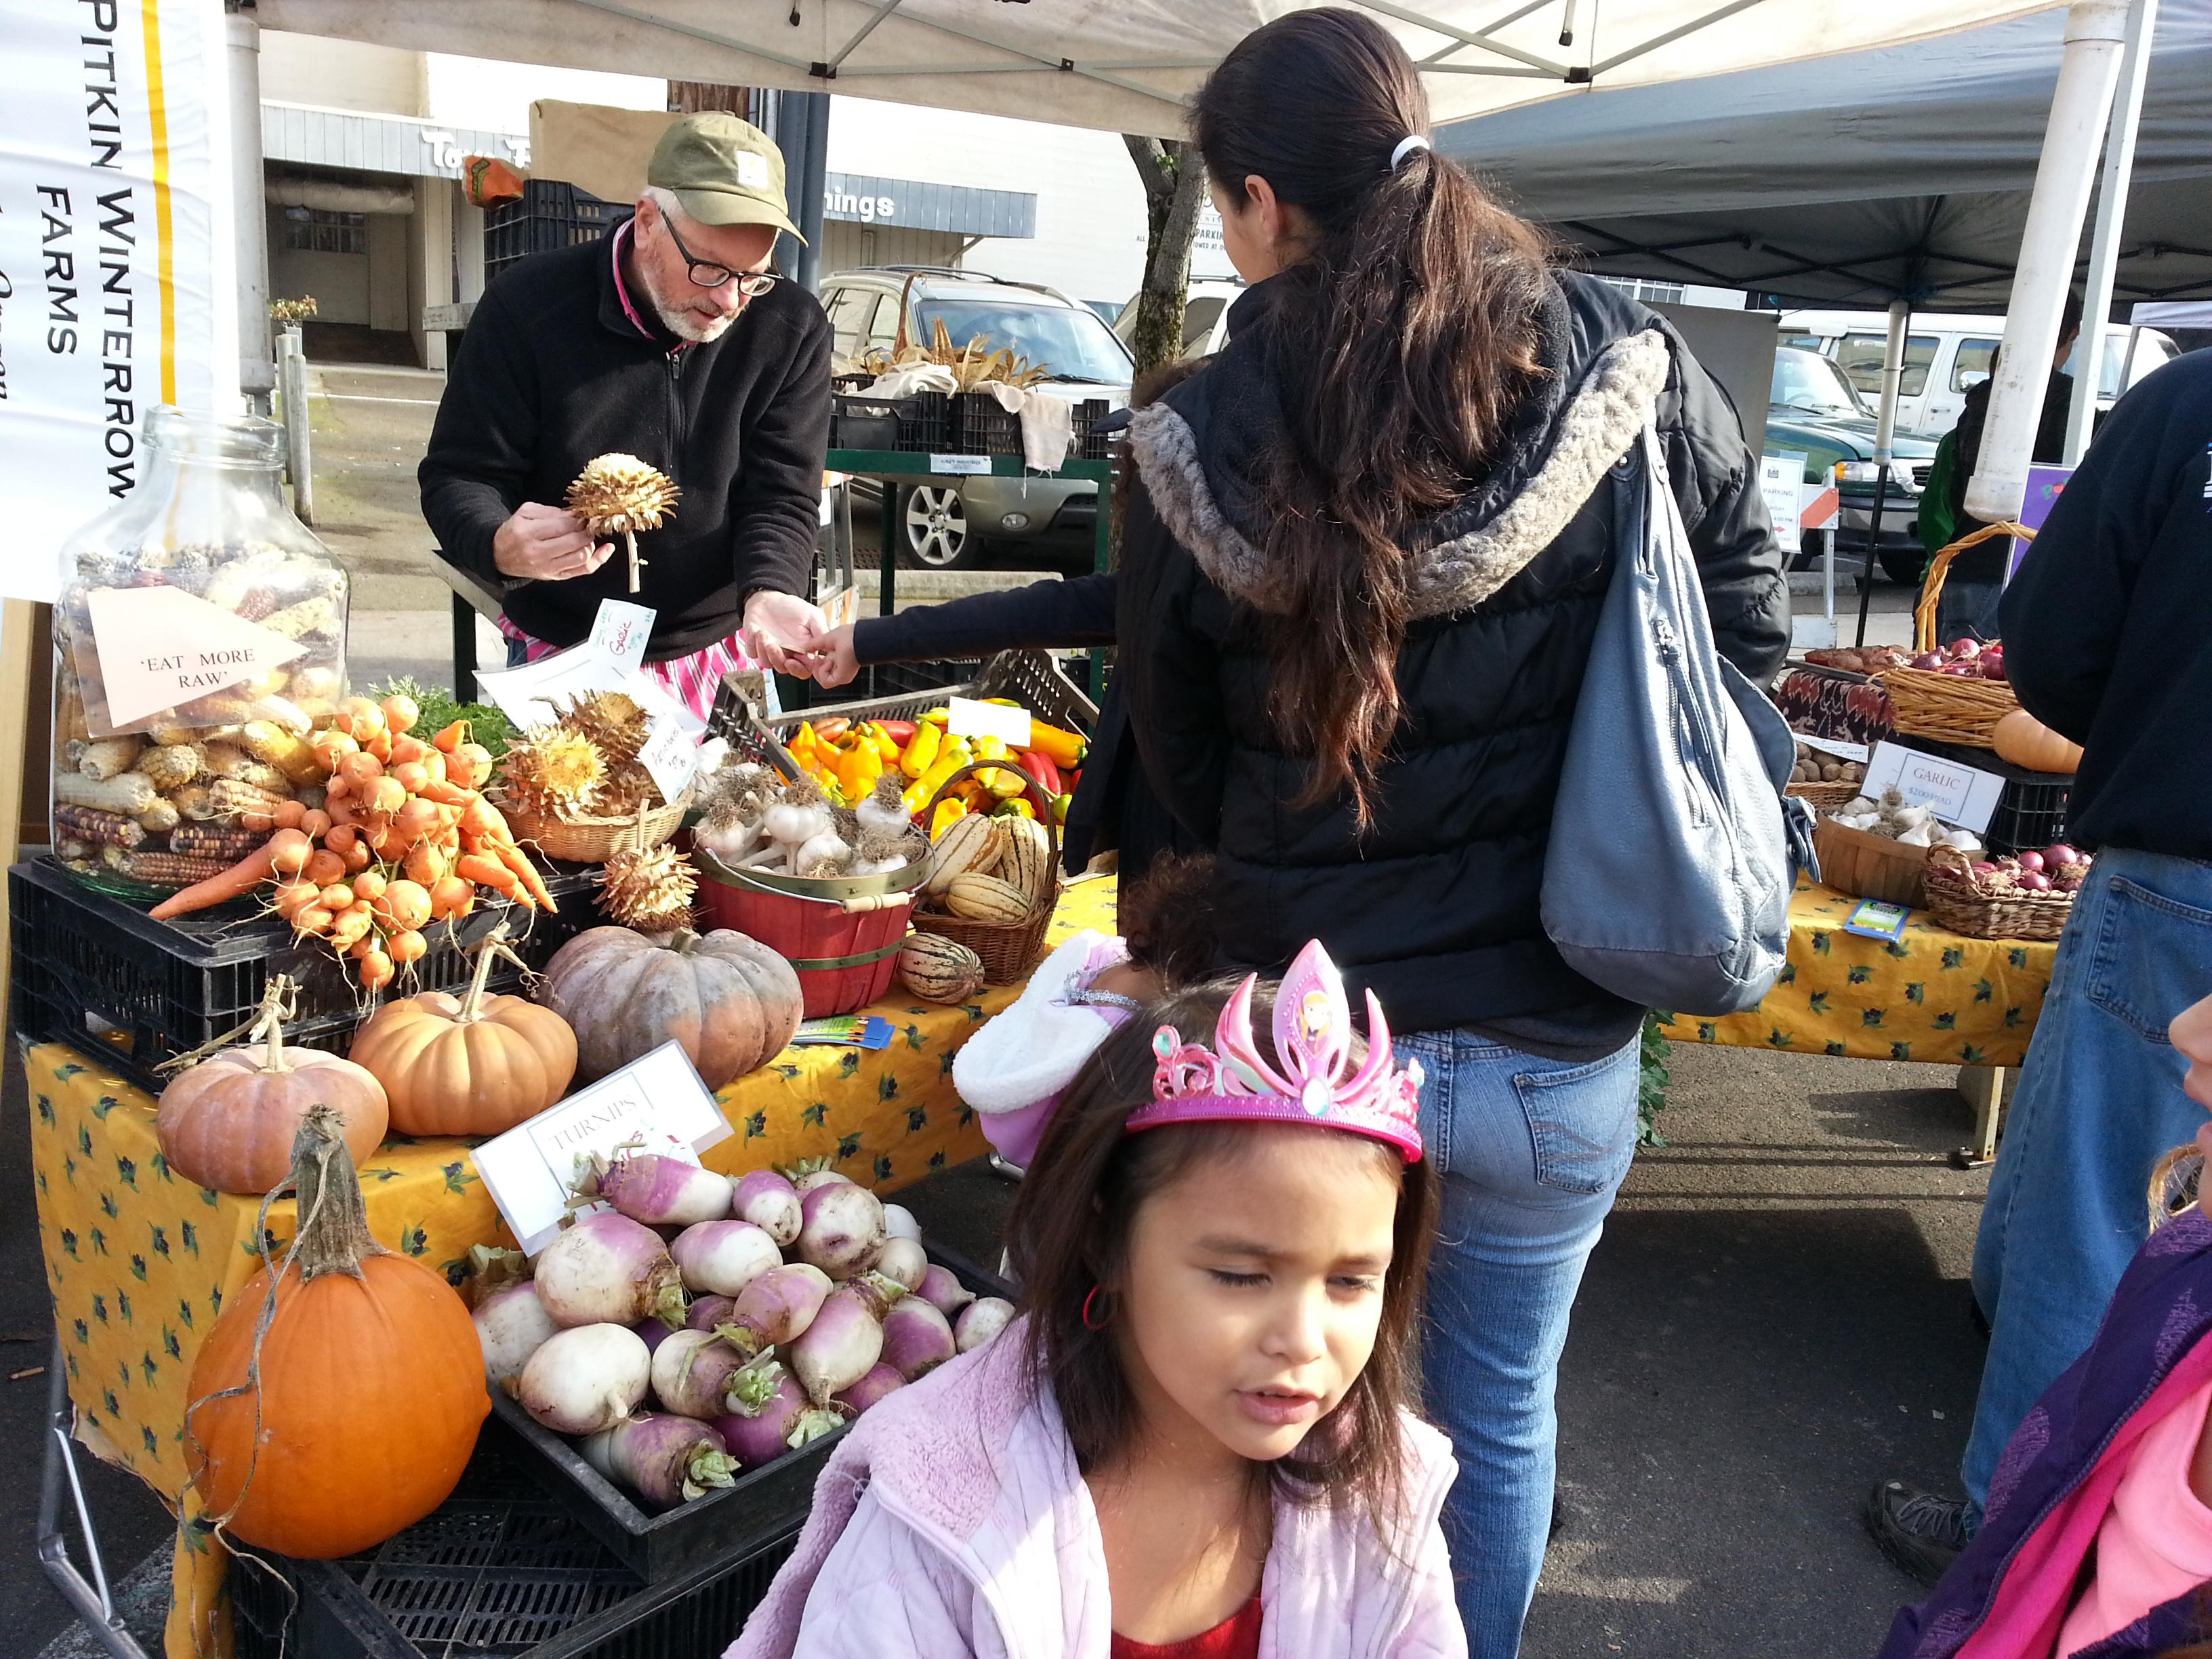 2014-11-08 10 39 15 - Oregon City Farmers Market